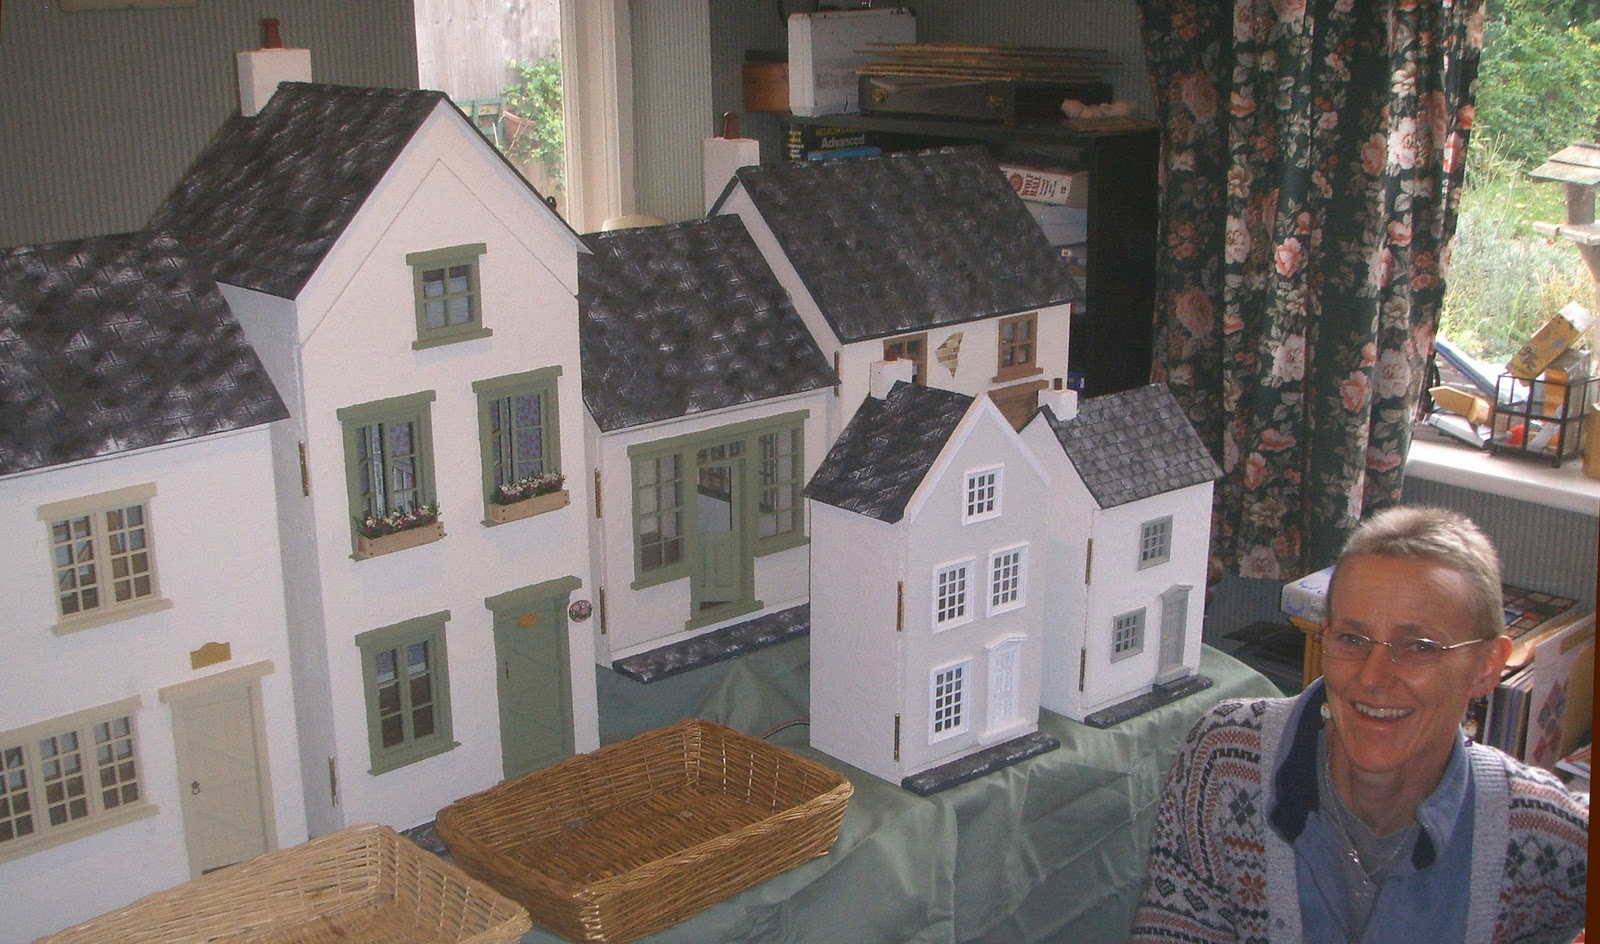 DOLLS HOUSE Handcrafted  =  TAKE A BREAK  MAGAZINE